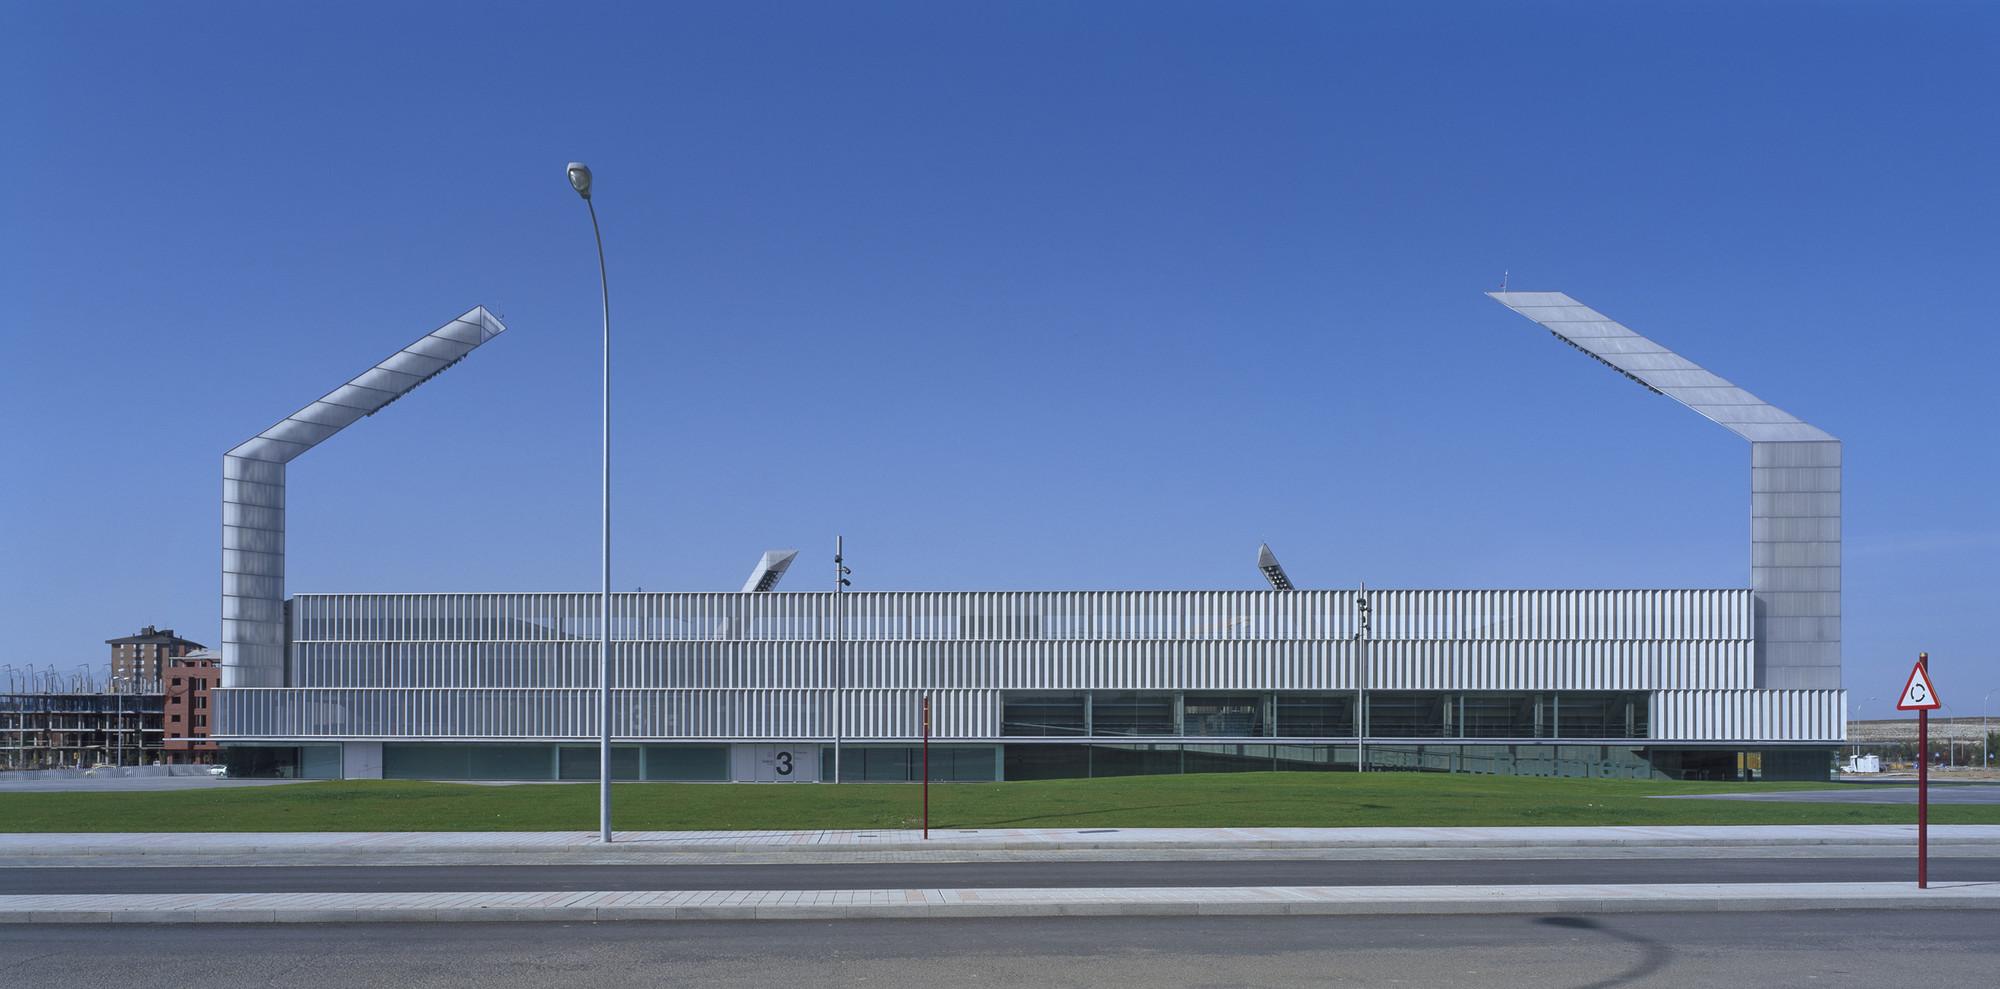 Soccer Stadium La Balastera / Francisco Mangado, © Roland Halbe